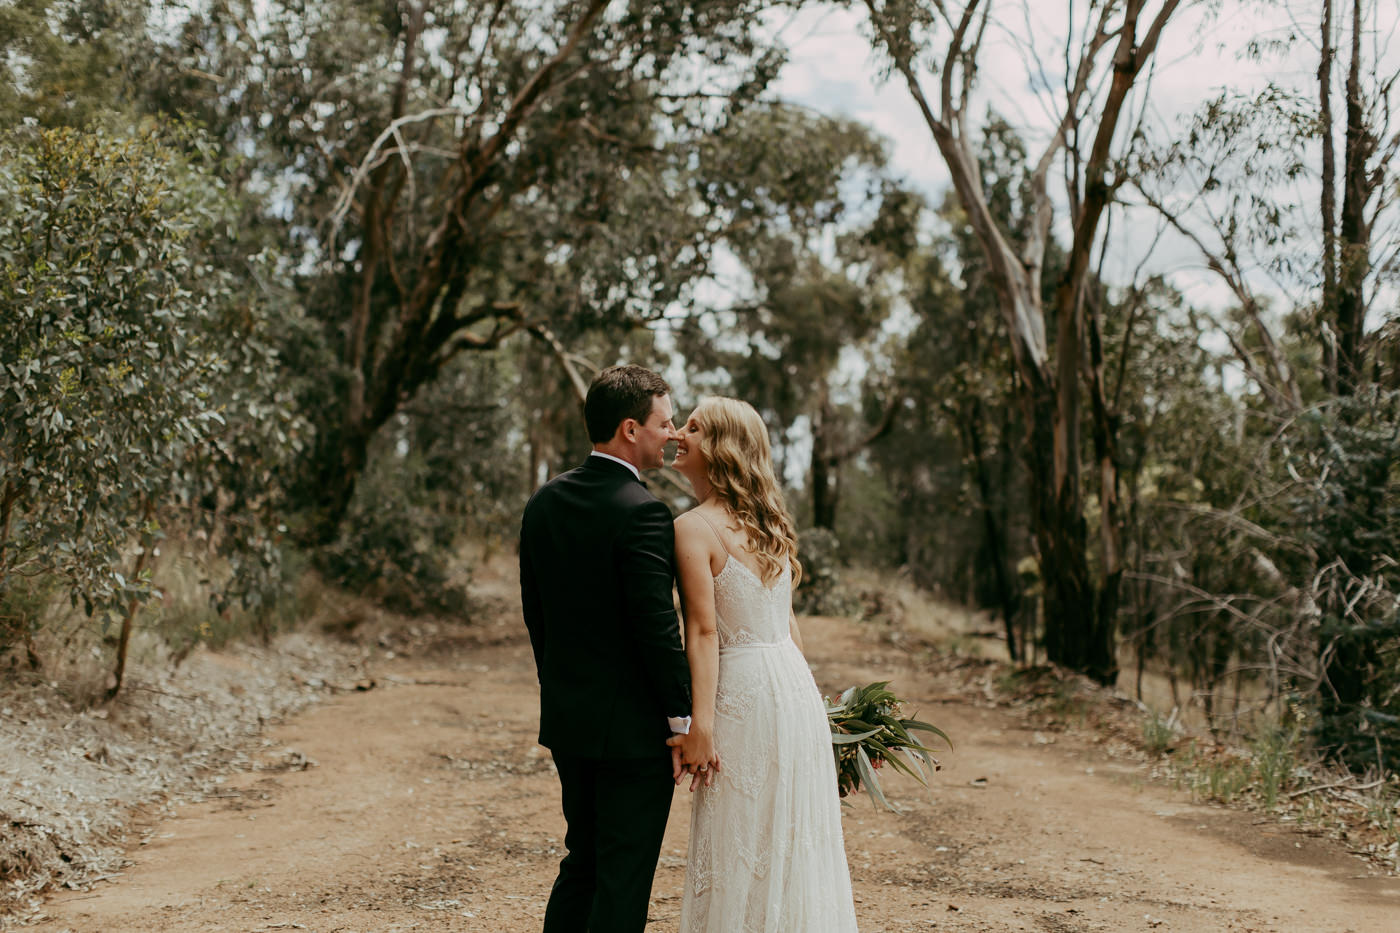 Anthony & Eliet - Wagga Wagga Wedding - Country NSW - Samantha Heather Photography-58.jpg